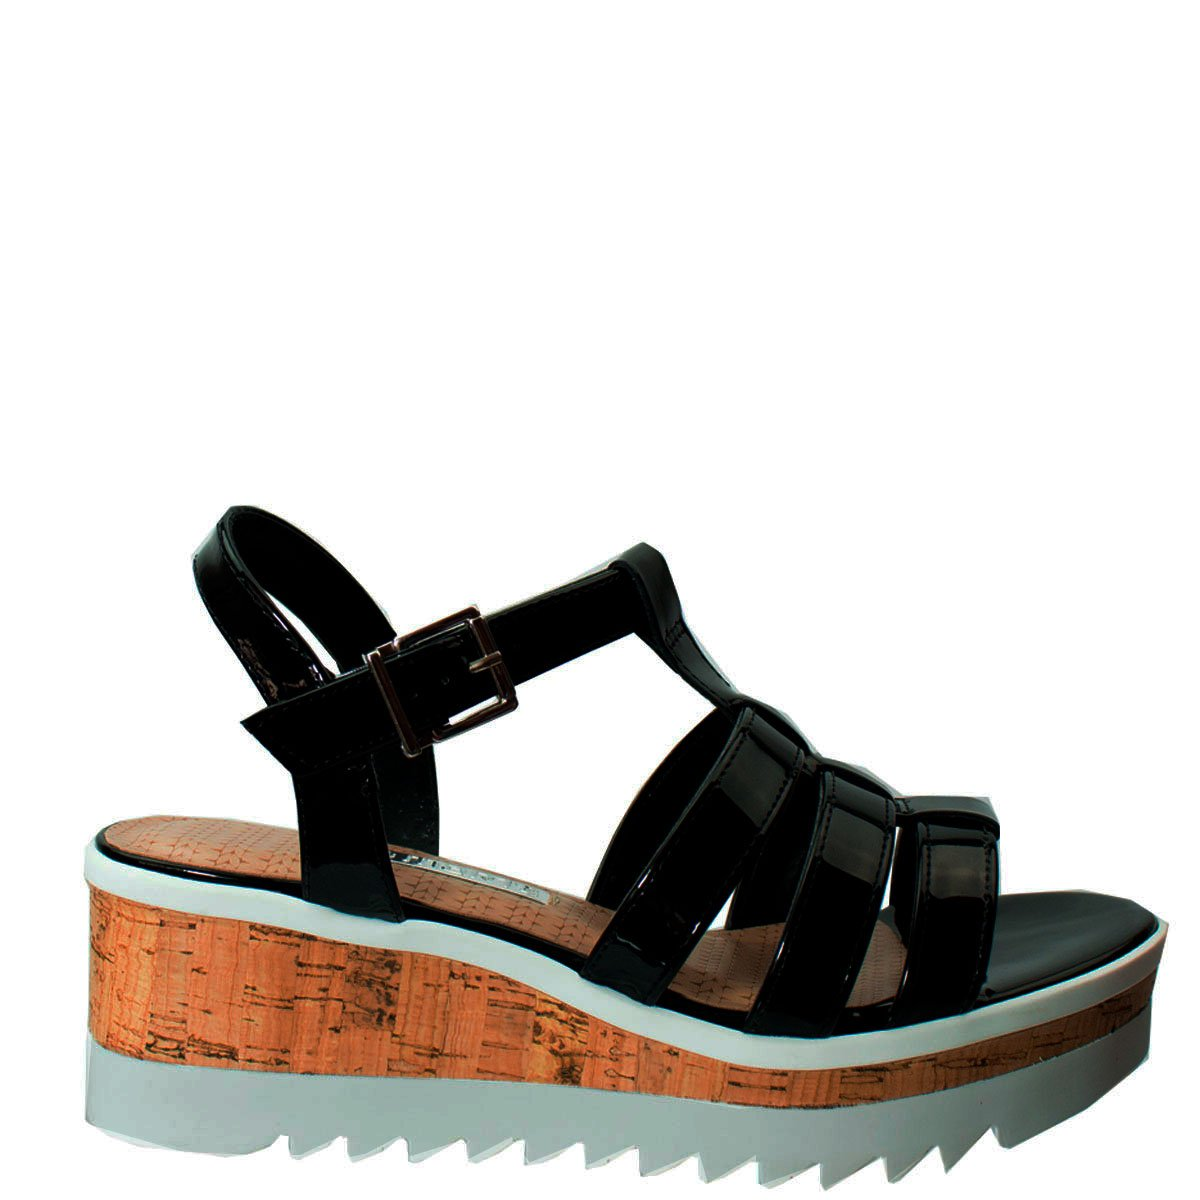 3fd429aba Bizz Store - Sandália Tratorada Feminina Via Marte Metalizada